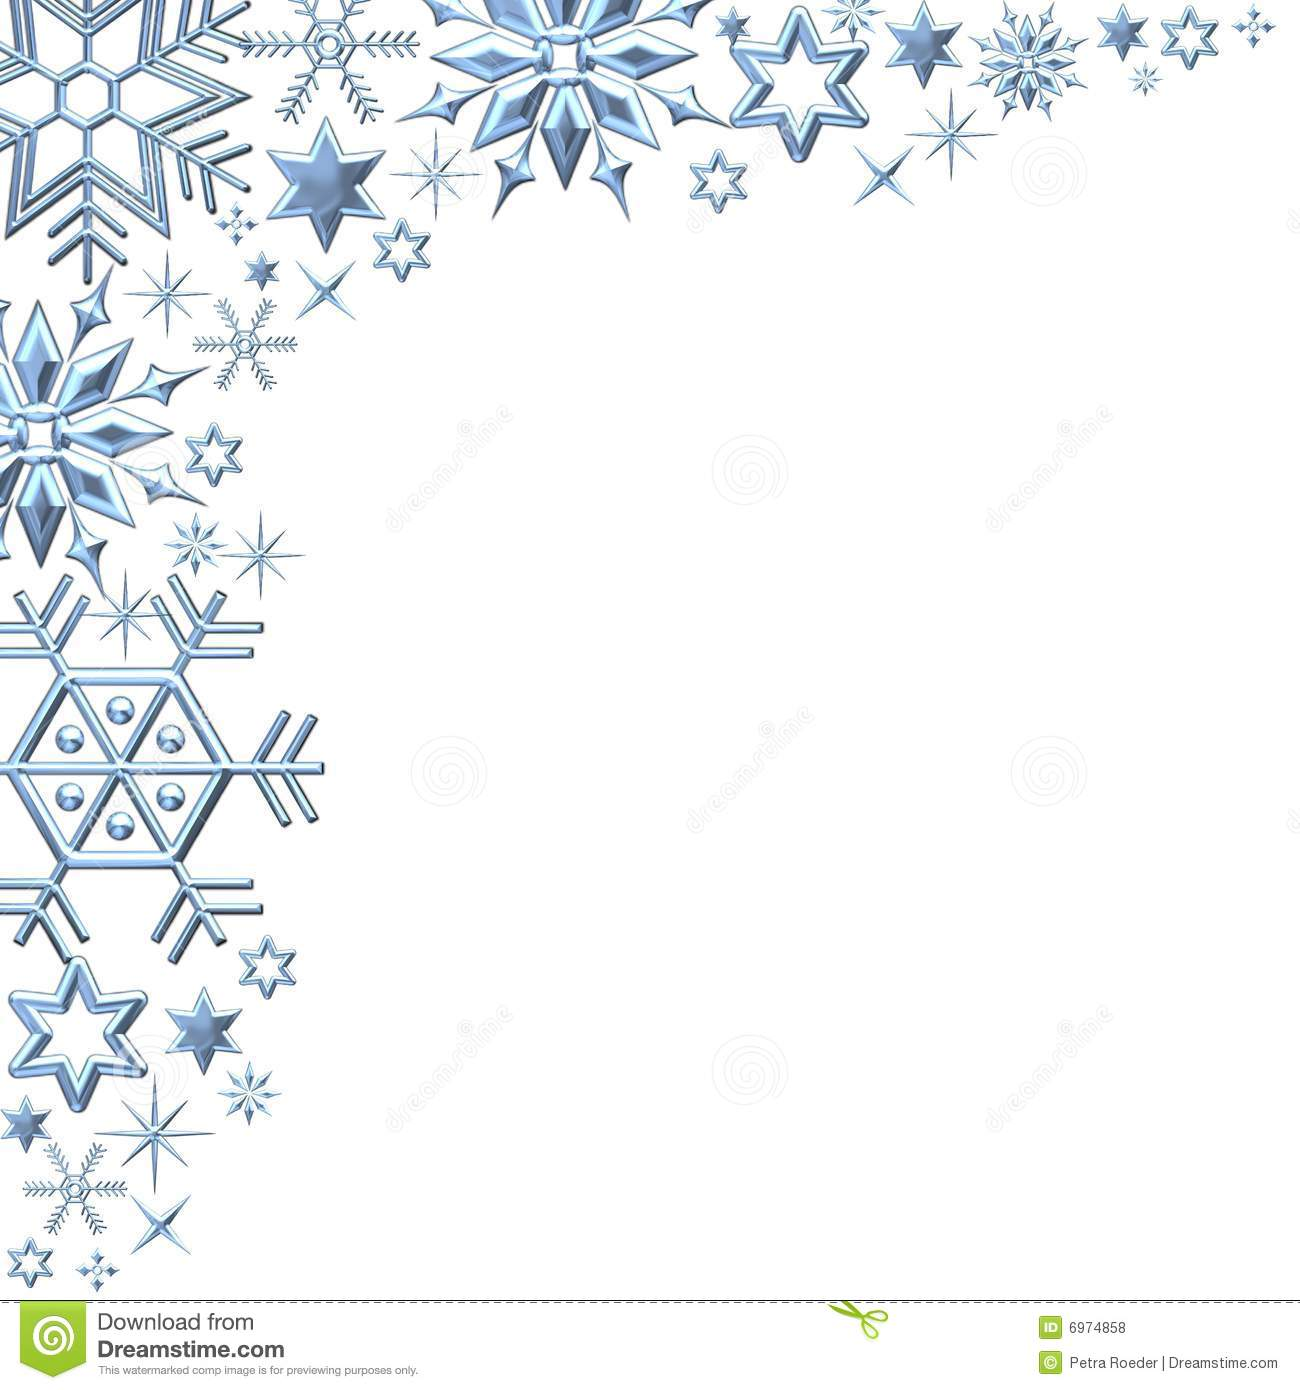 Snow Border Clipart.